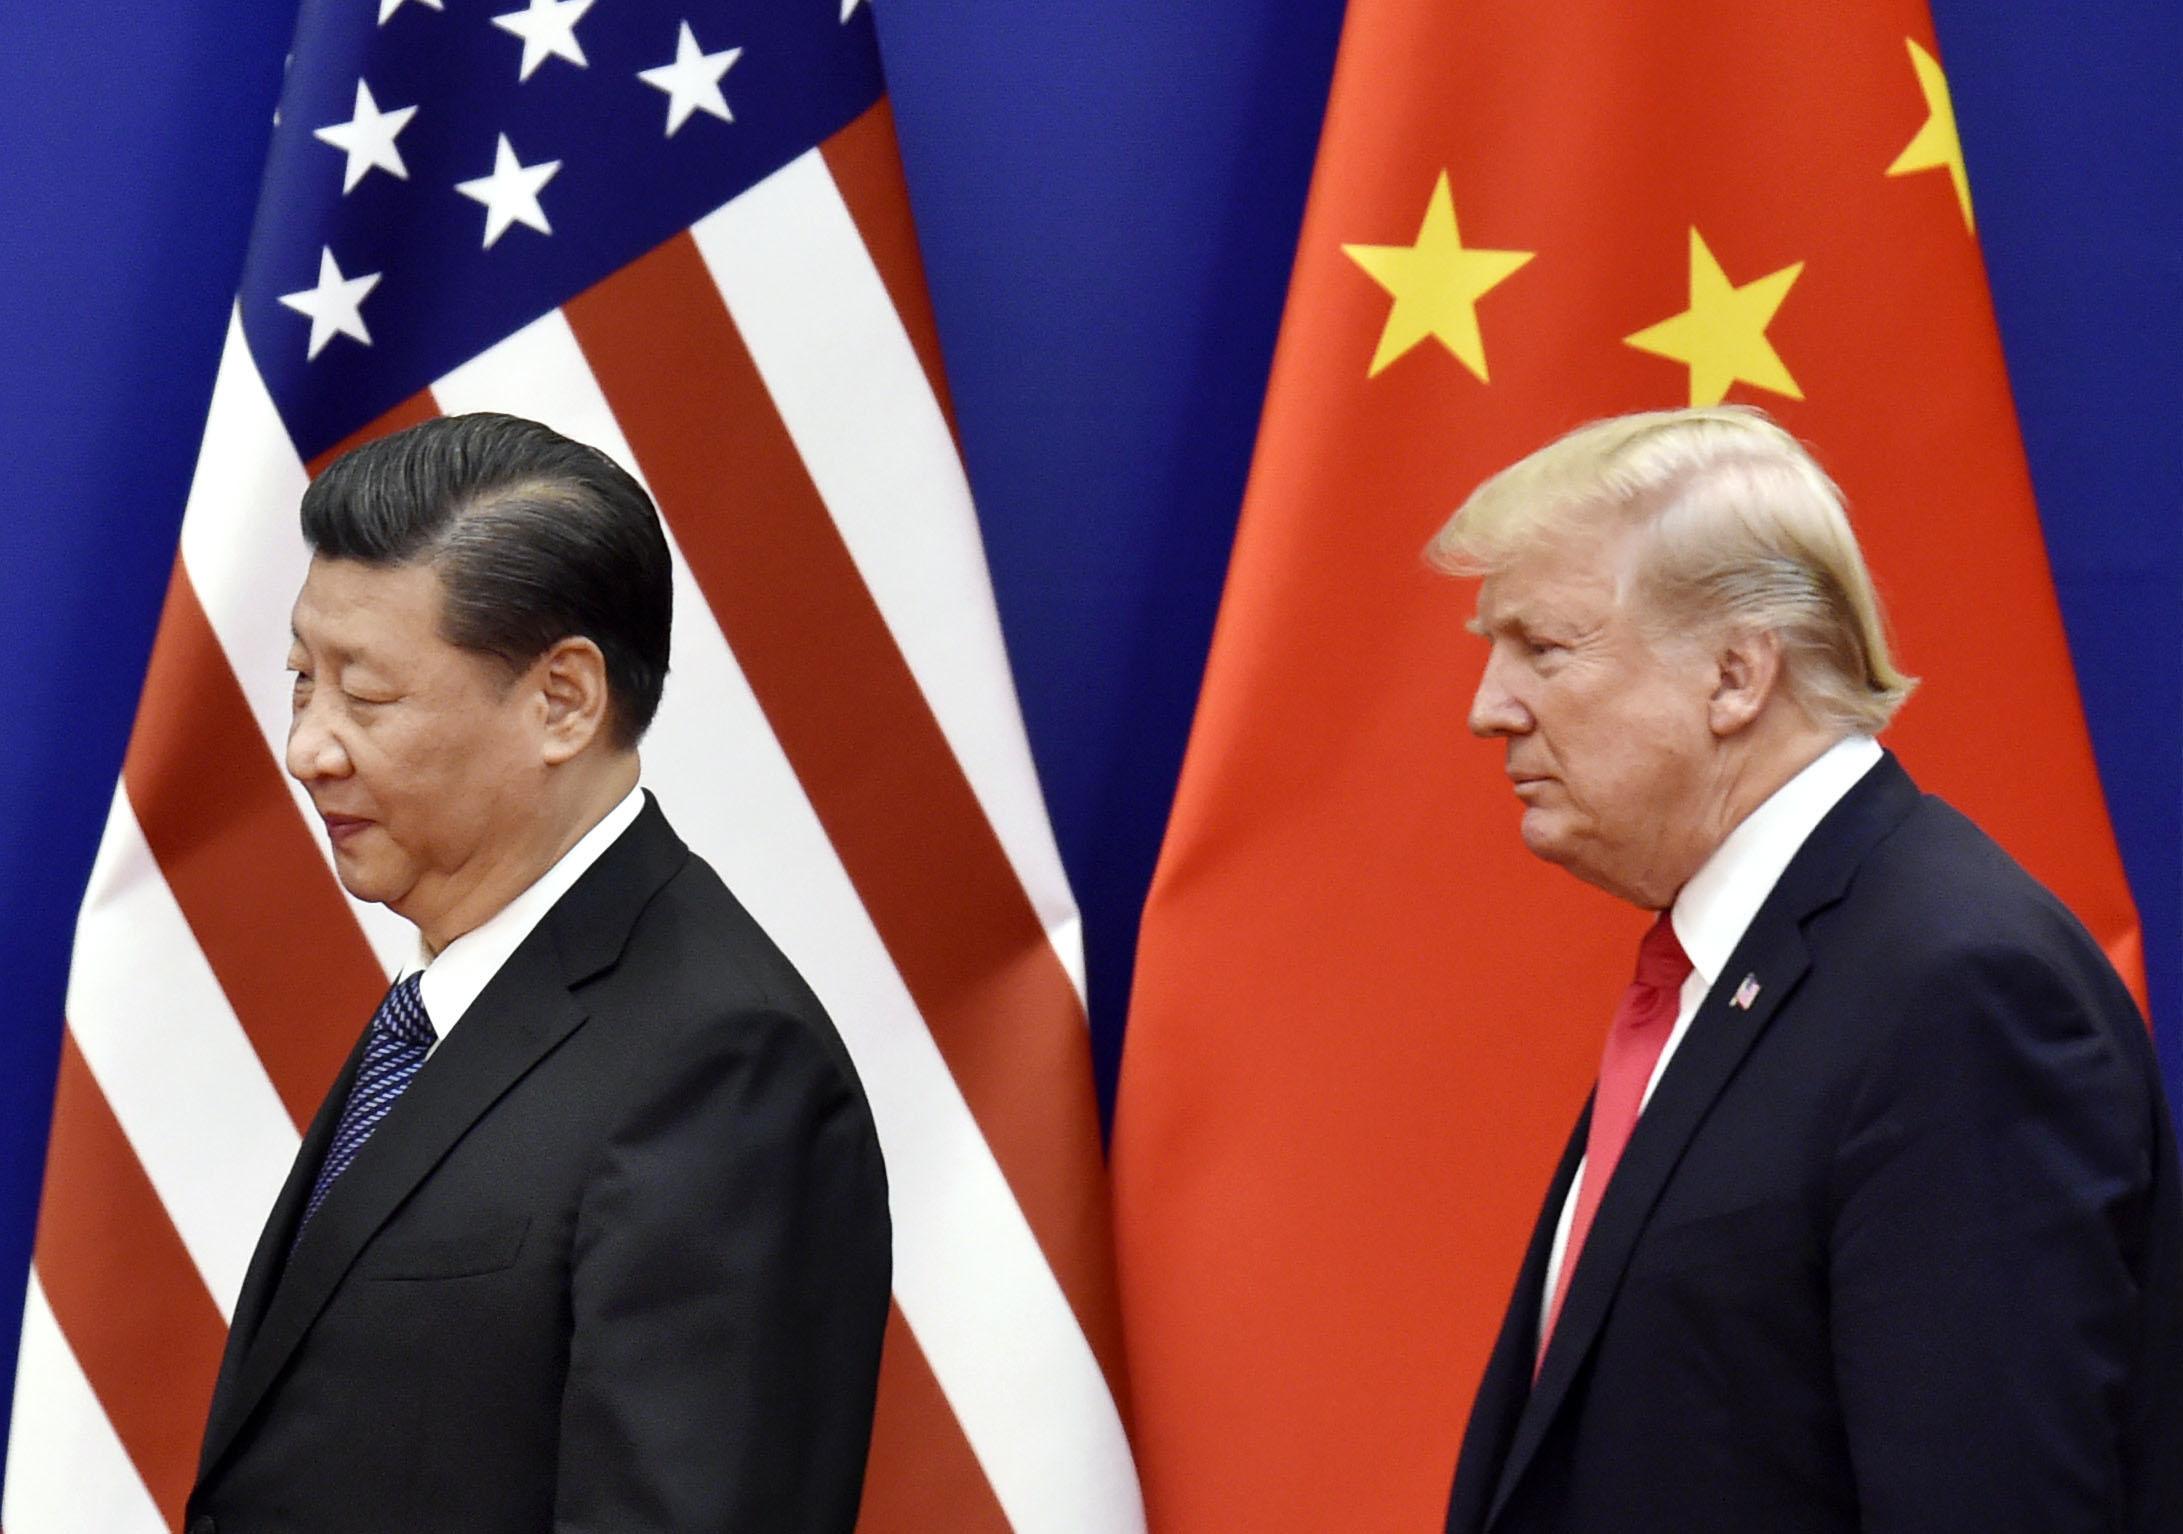 Trump's Trade War Bullet A Direct Hit on 'Dinosaur' China